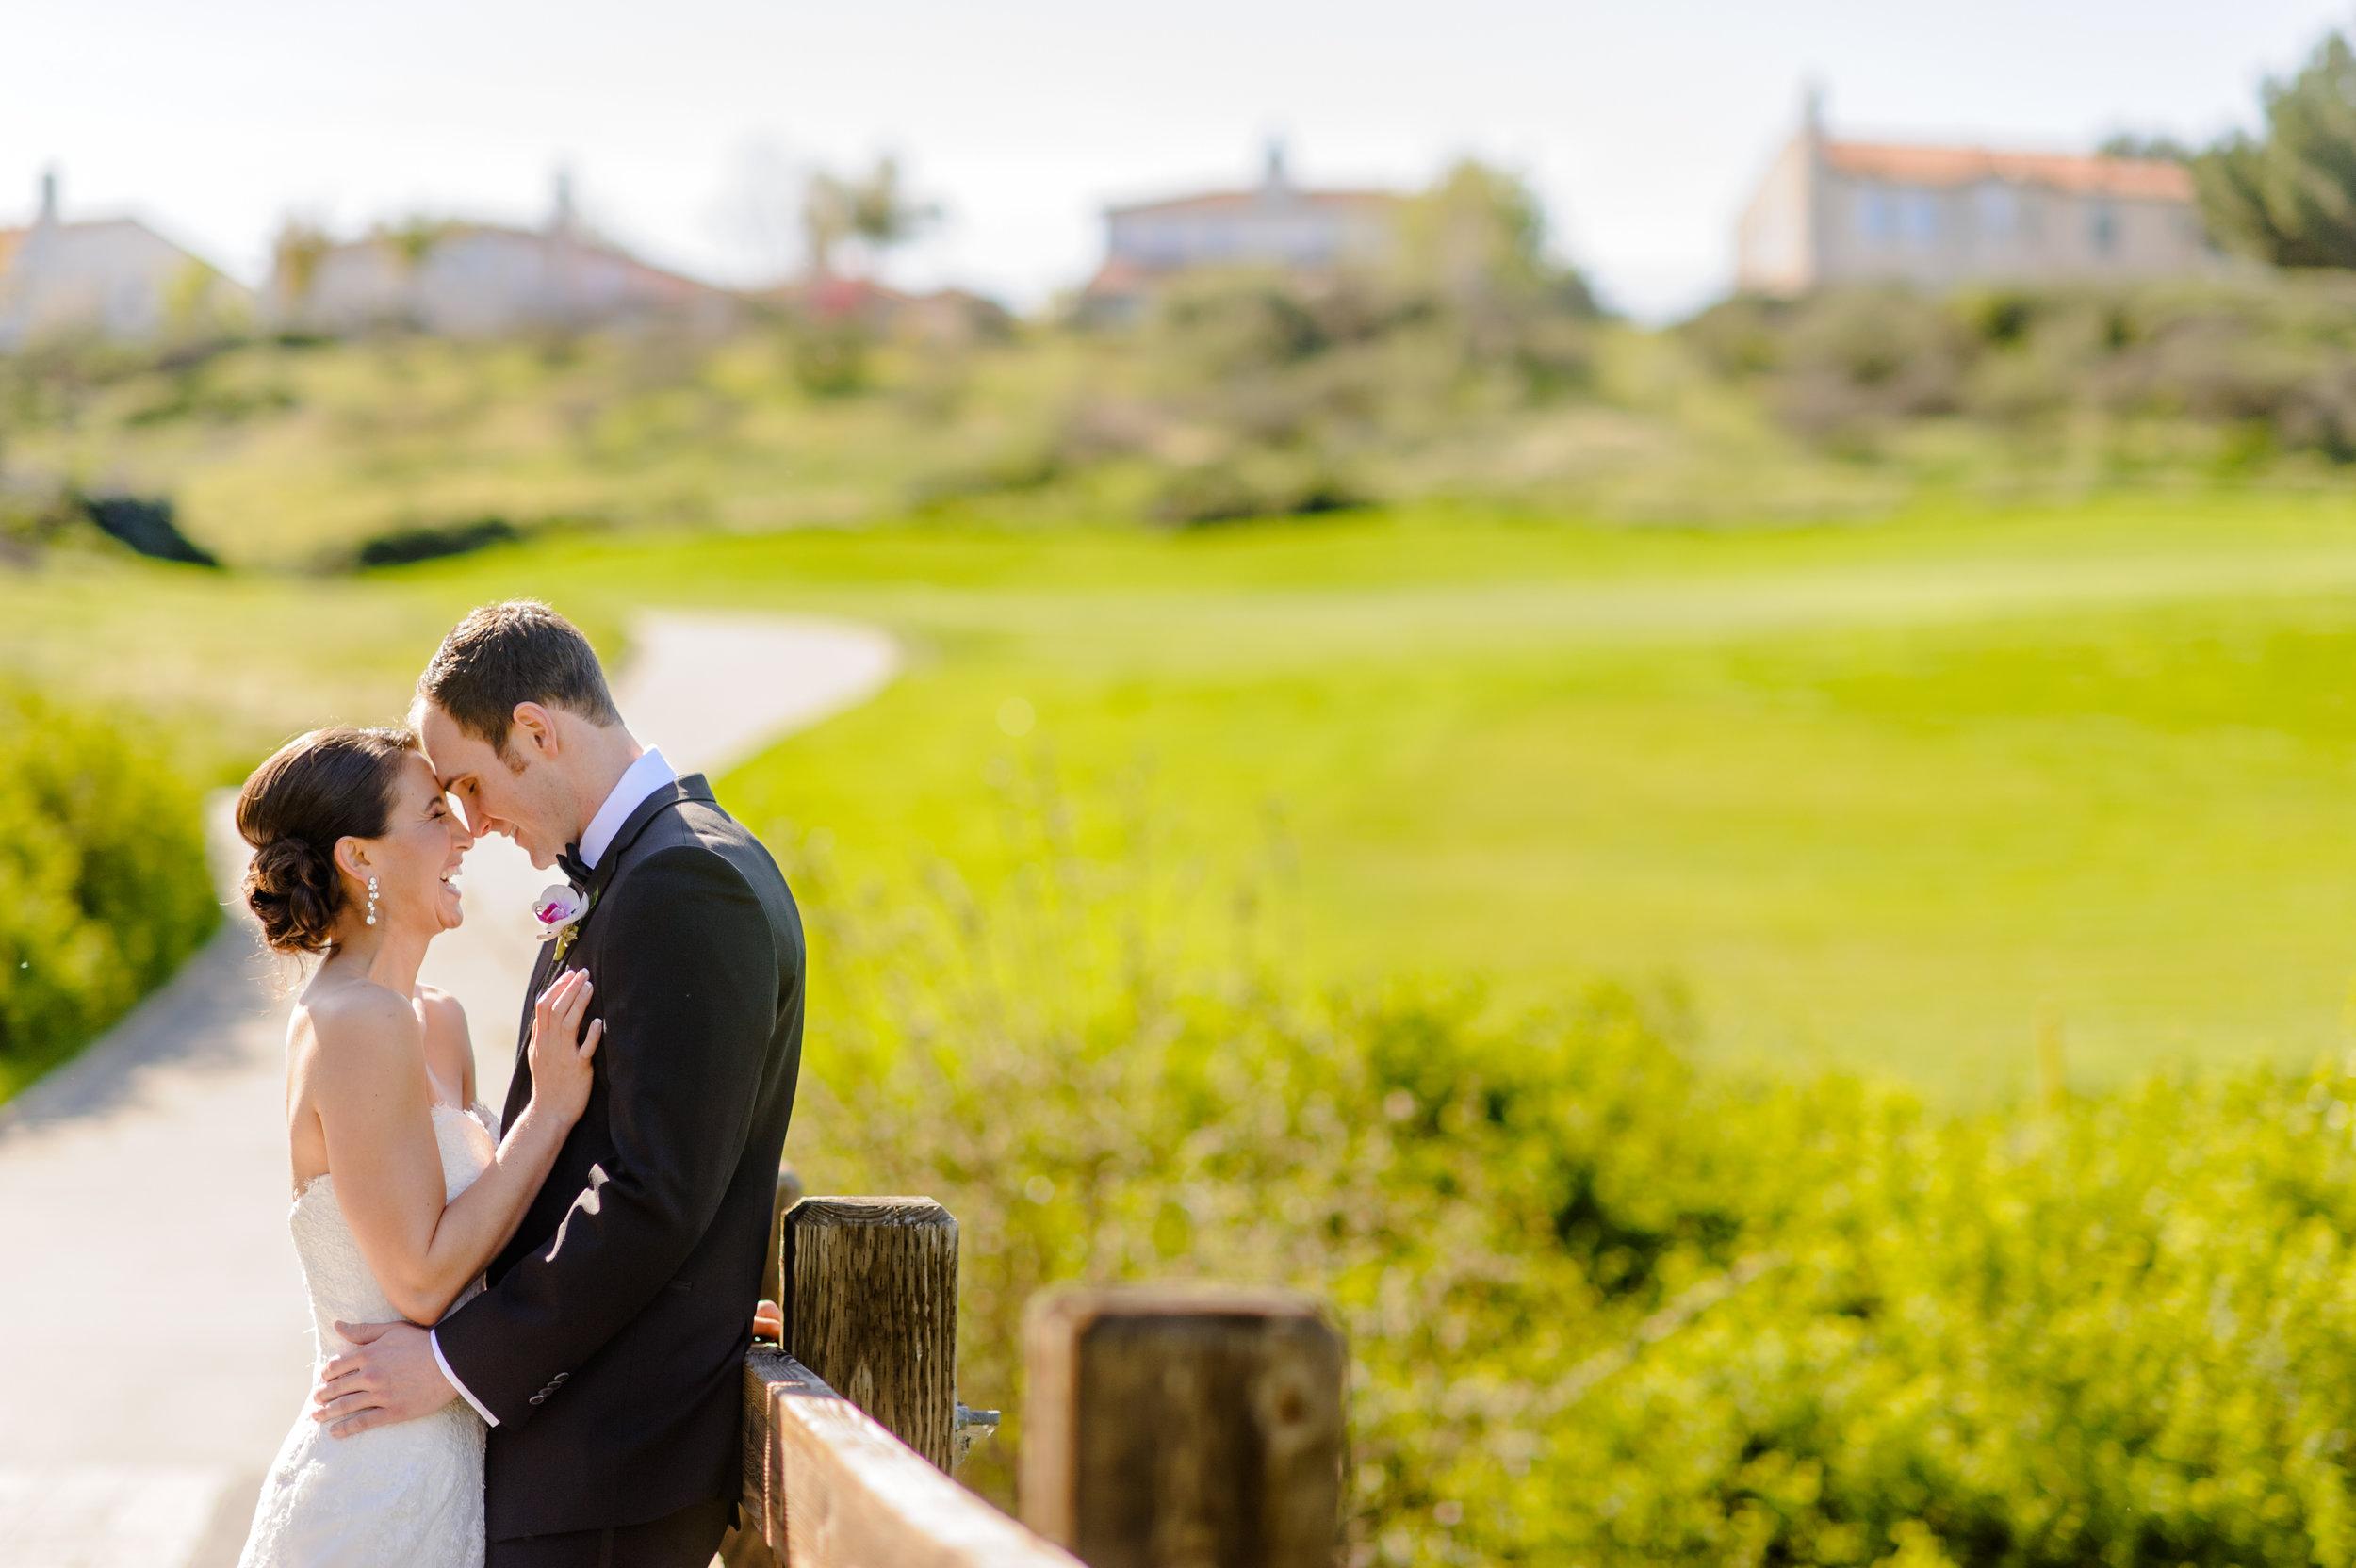 lindsey-jake-013-the-bridges-golf-course-san-ramon-wedding-photographer-katherine-nicole-photography.JPG